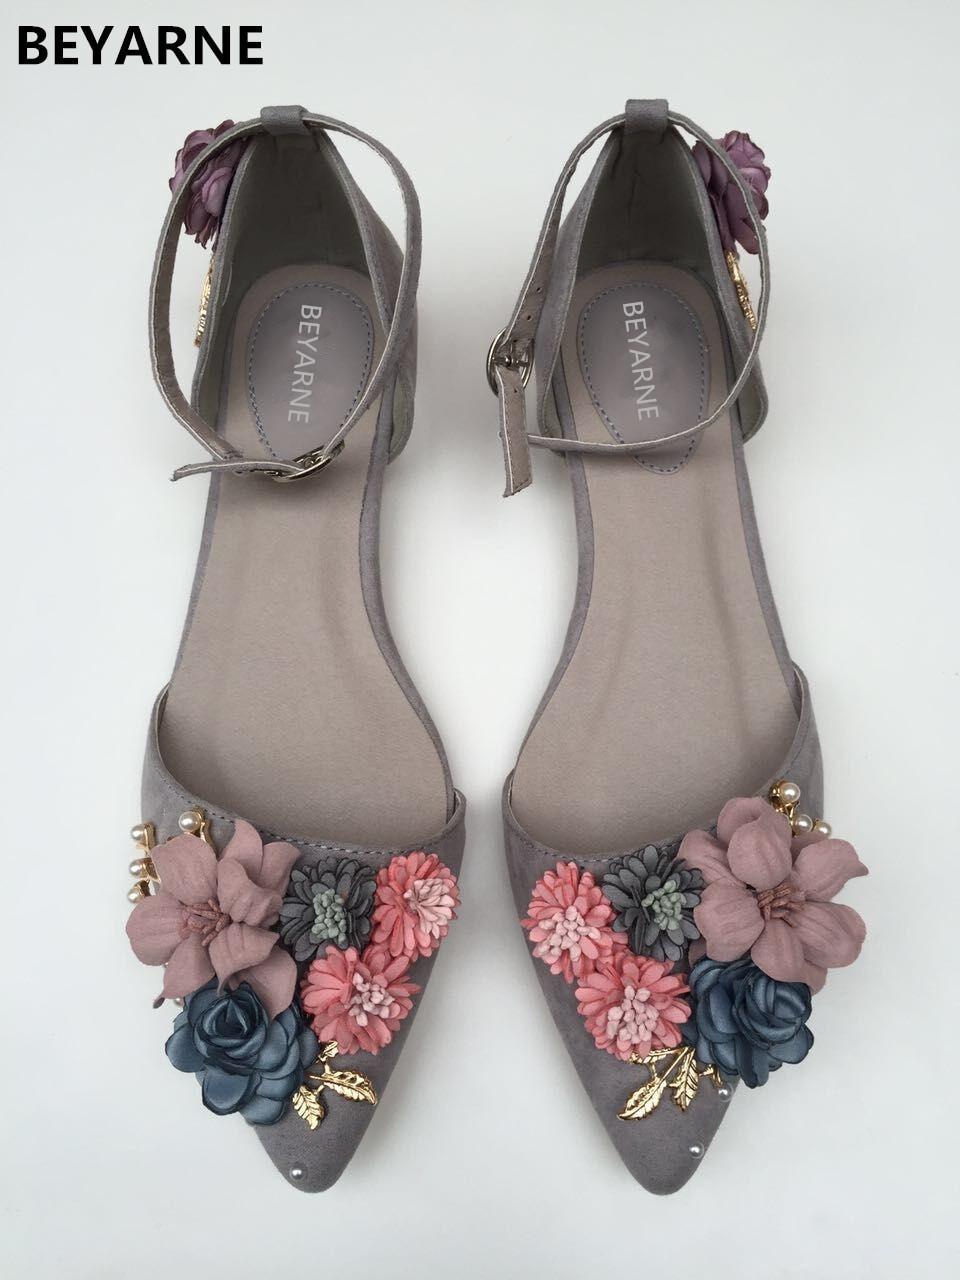 BEYARNE New Fashion women flat shoes